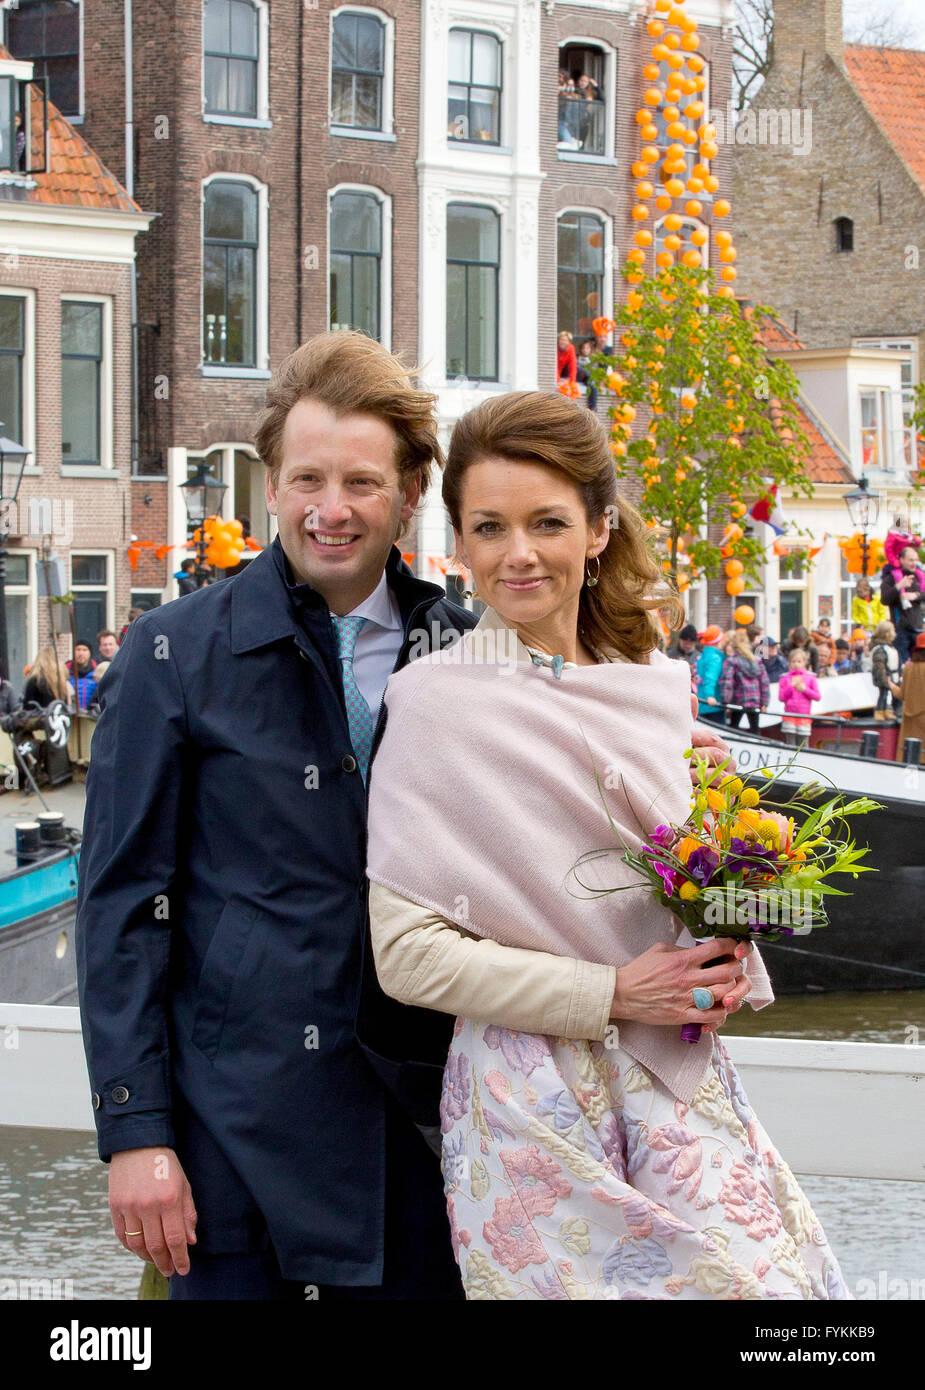 Zwolle, 27-04-2016 Prince Floris and Princess Aimée HM King